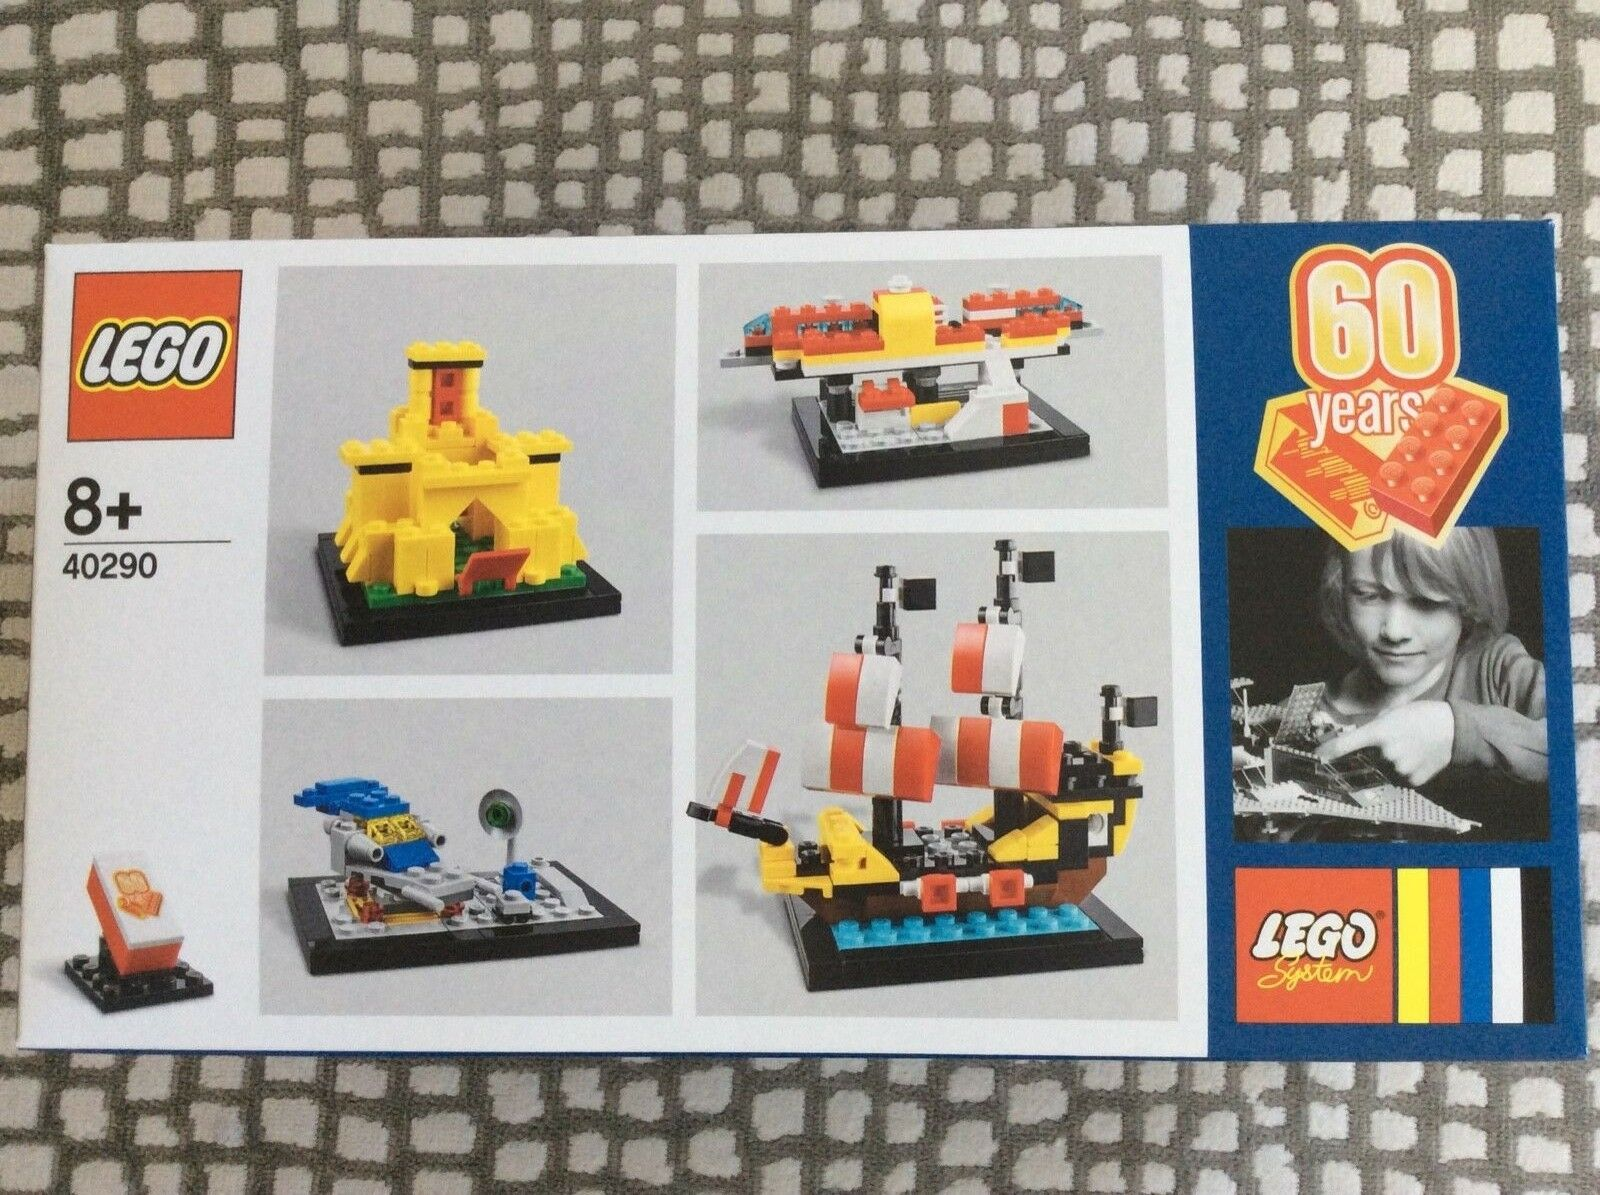 NEUF LEGO 40290  60 ans de la brique (4x Mini-Builds) - LEGO birthday set